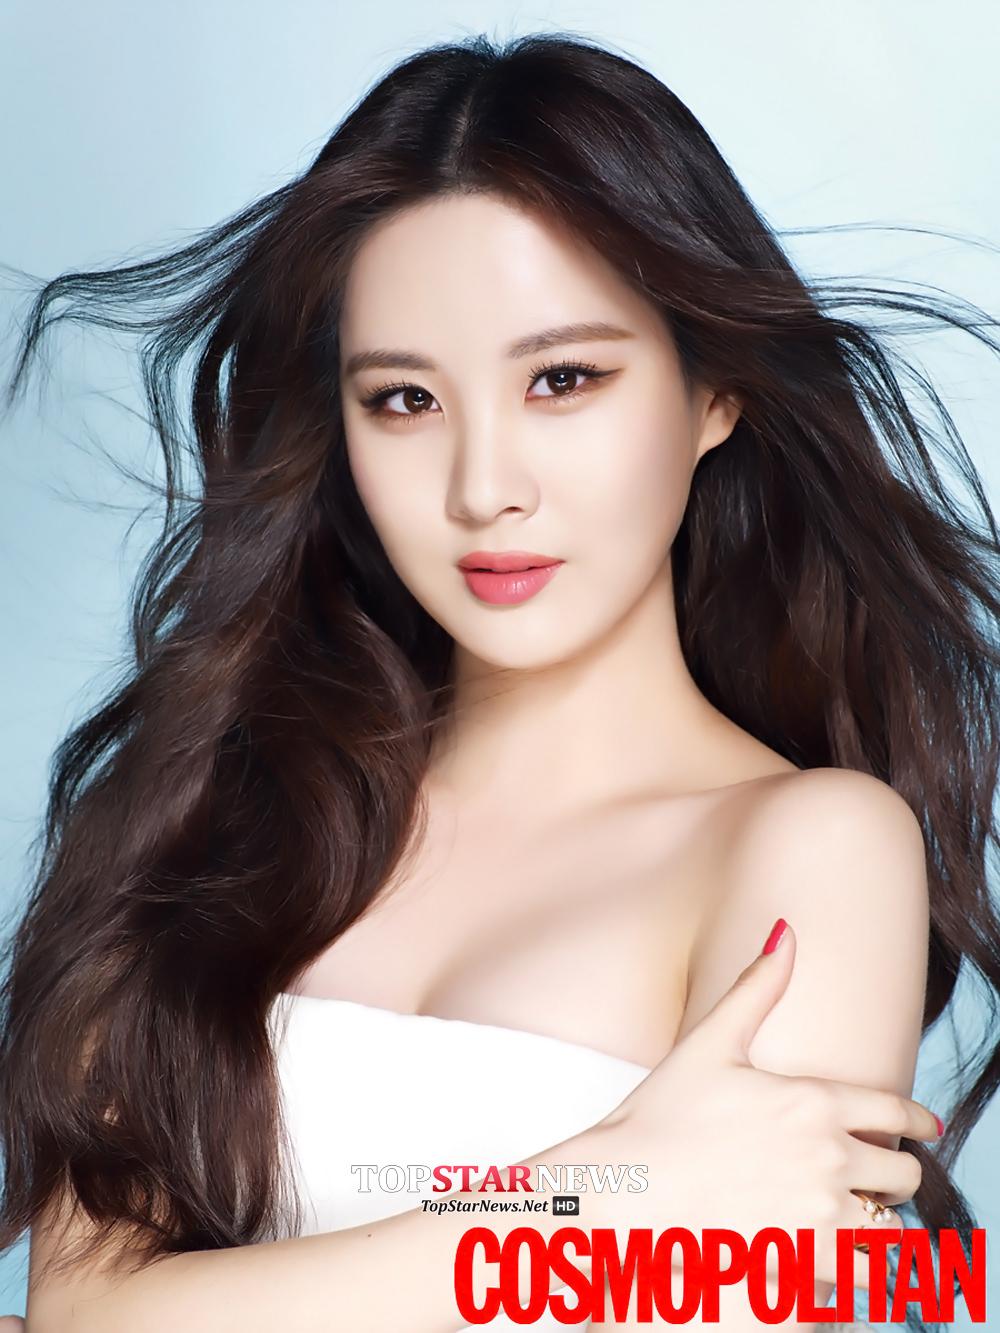 seohyun porn 0 comments, 45 Seohyun - Cosmopolitan May 2015 'Cosmo Beauty', ...